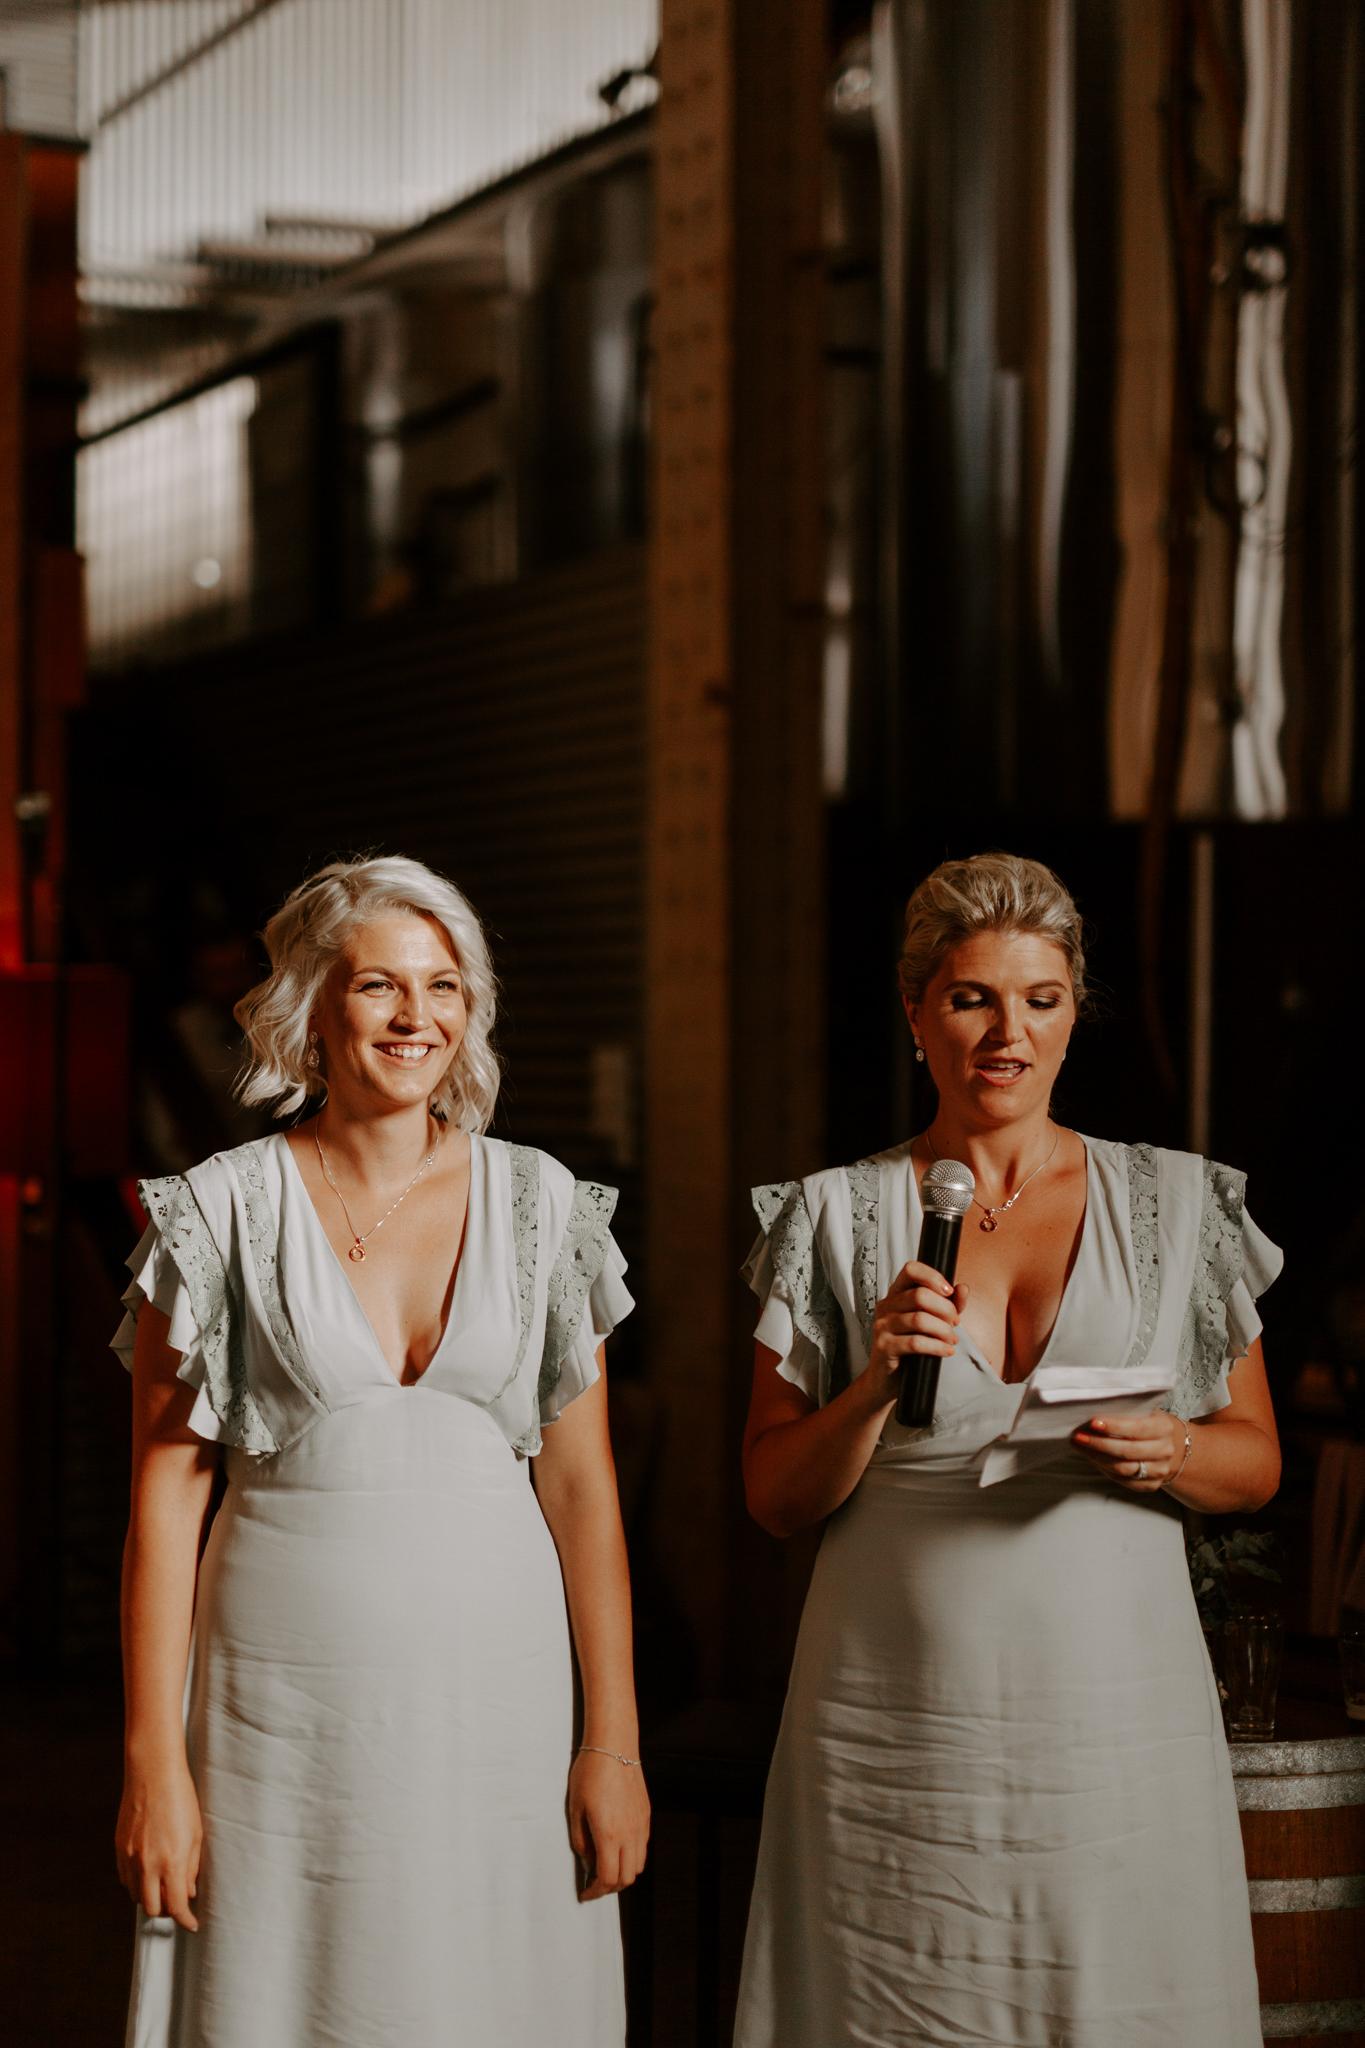 Mountain-Goat-Brewery-wedding-094.jpg